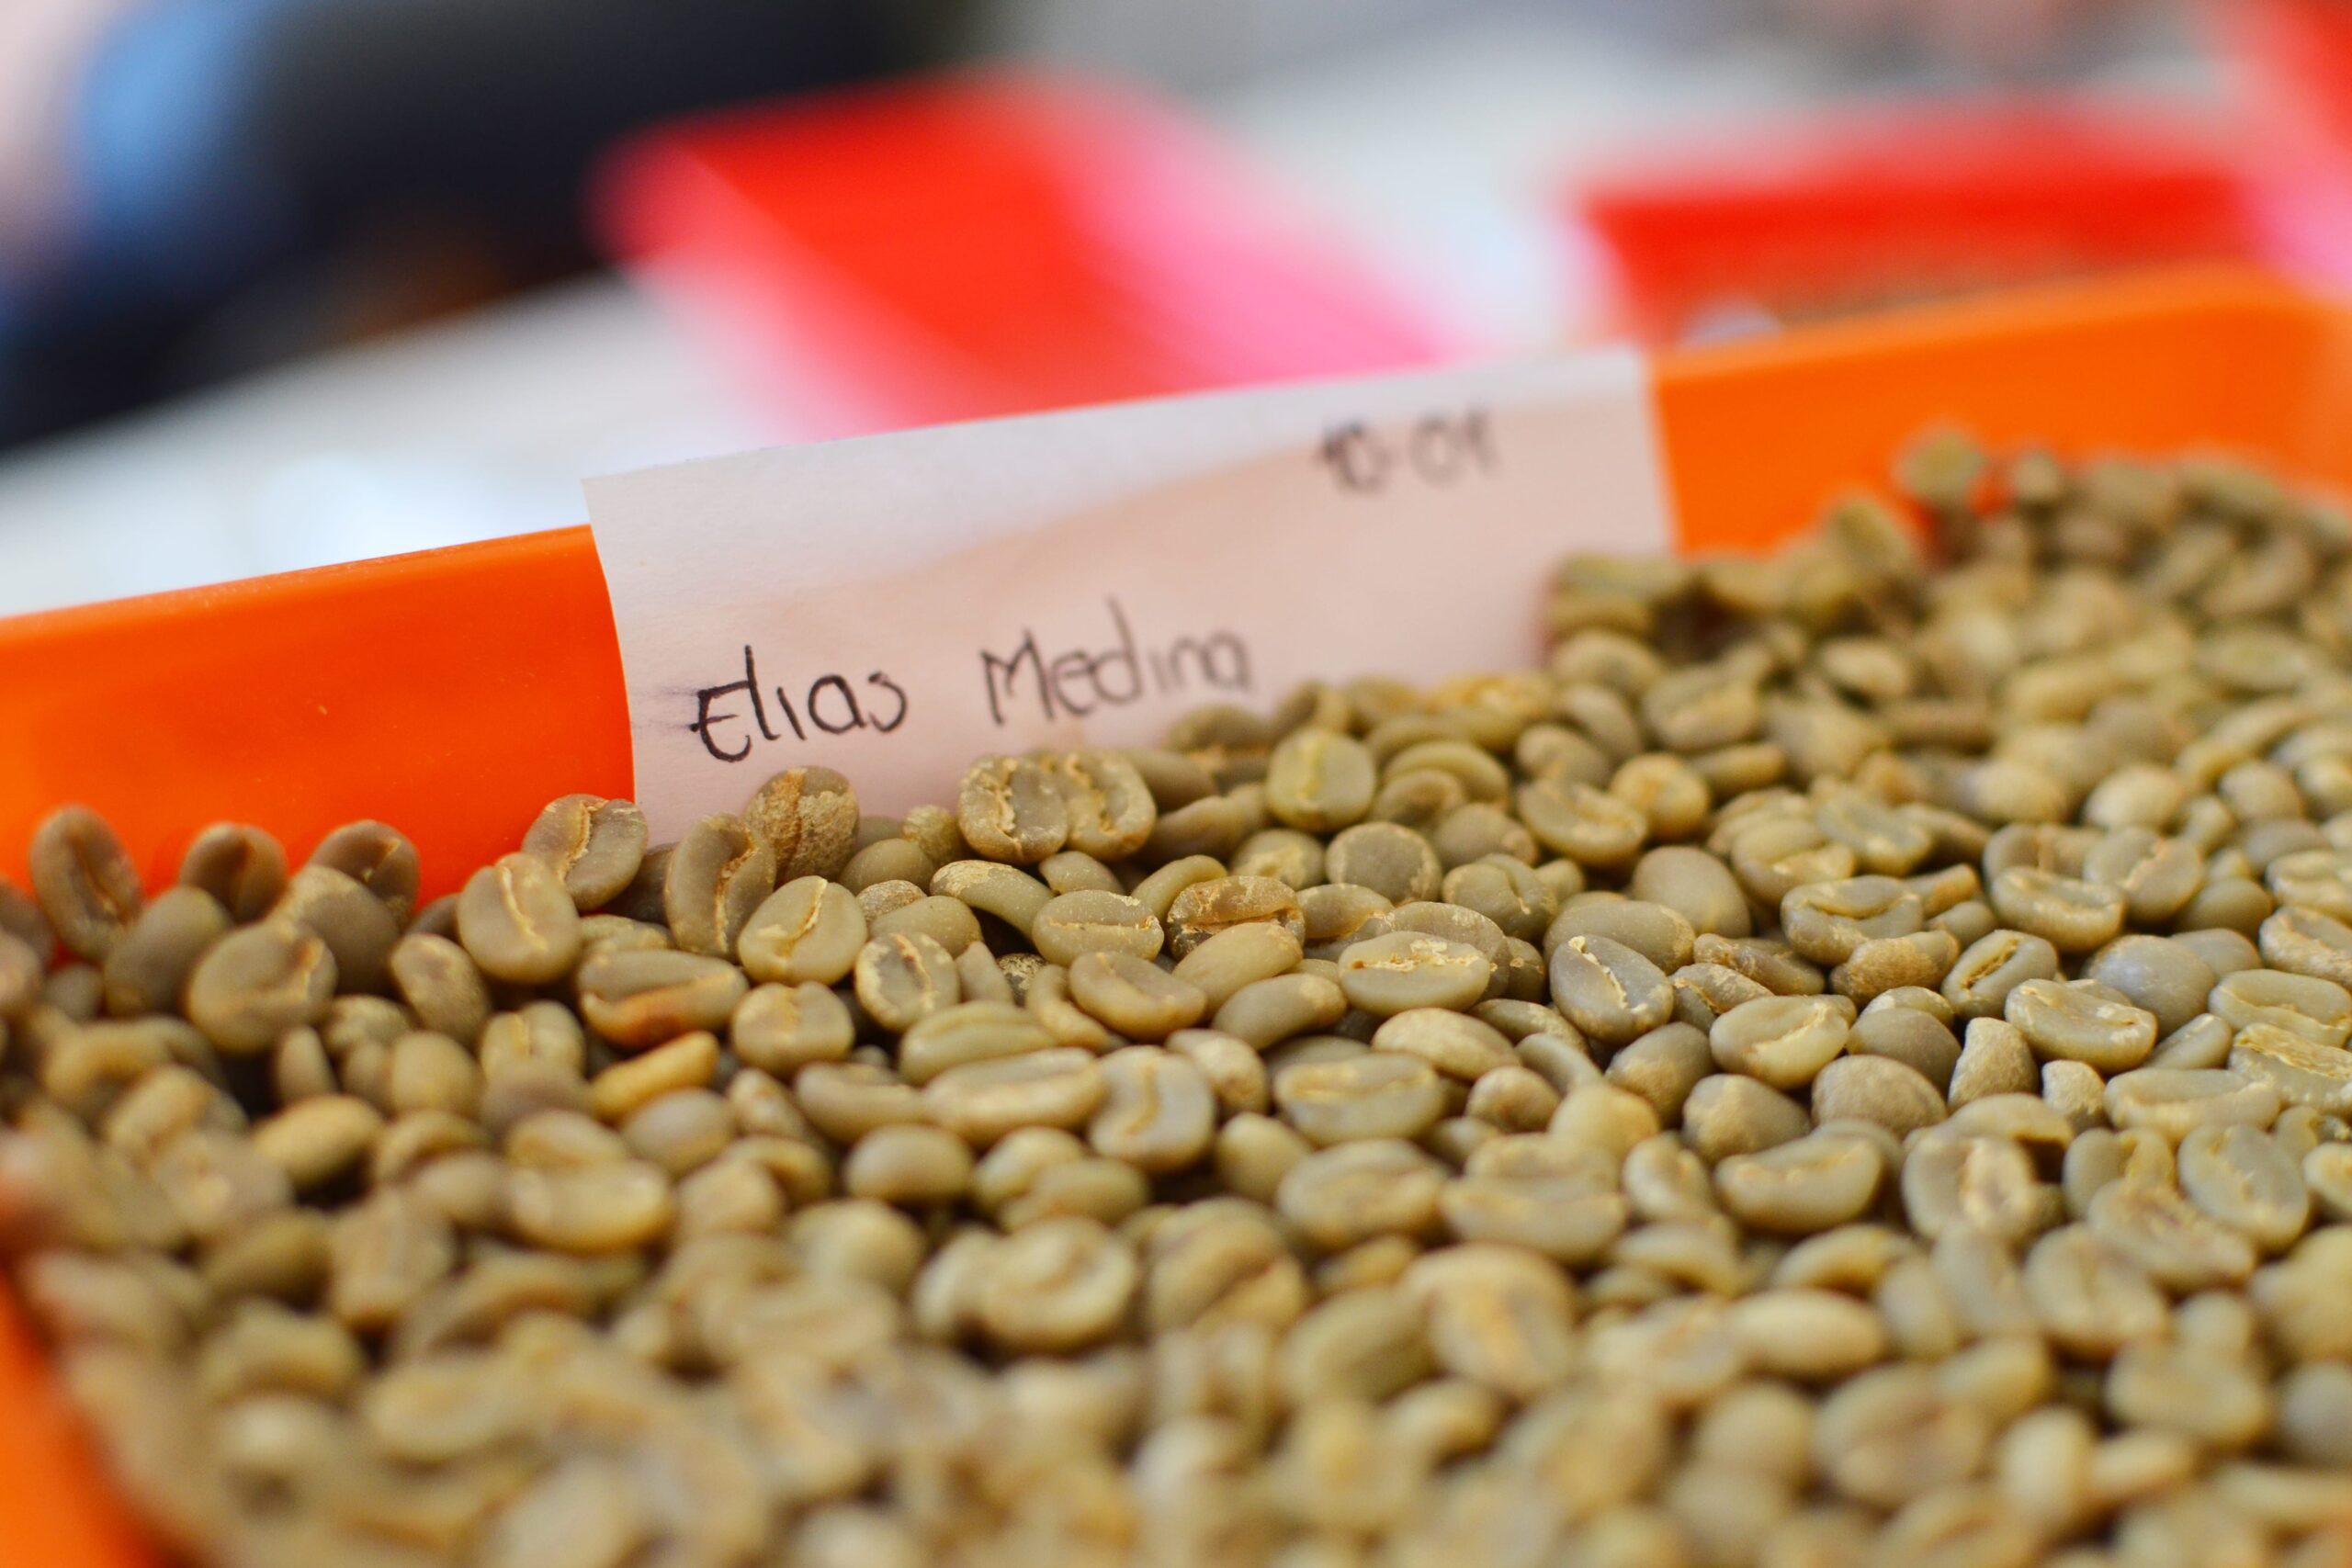 Colombia Inza Cauca - Jassyro Specialty Coffee - Cafea de specialitate prajita de Origo - Jassyro